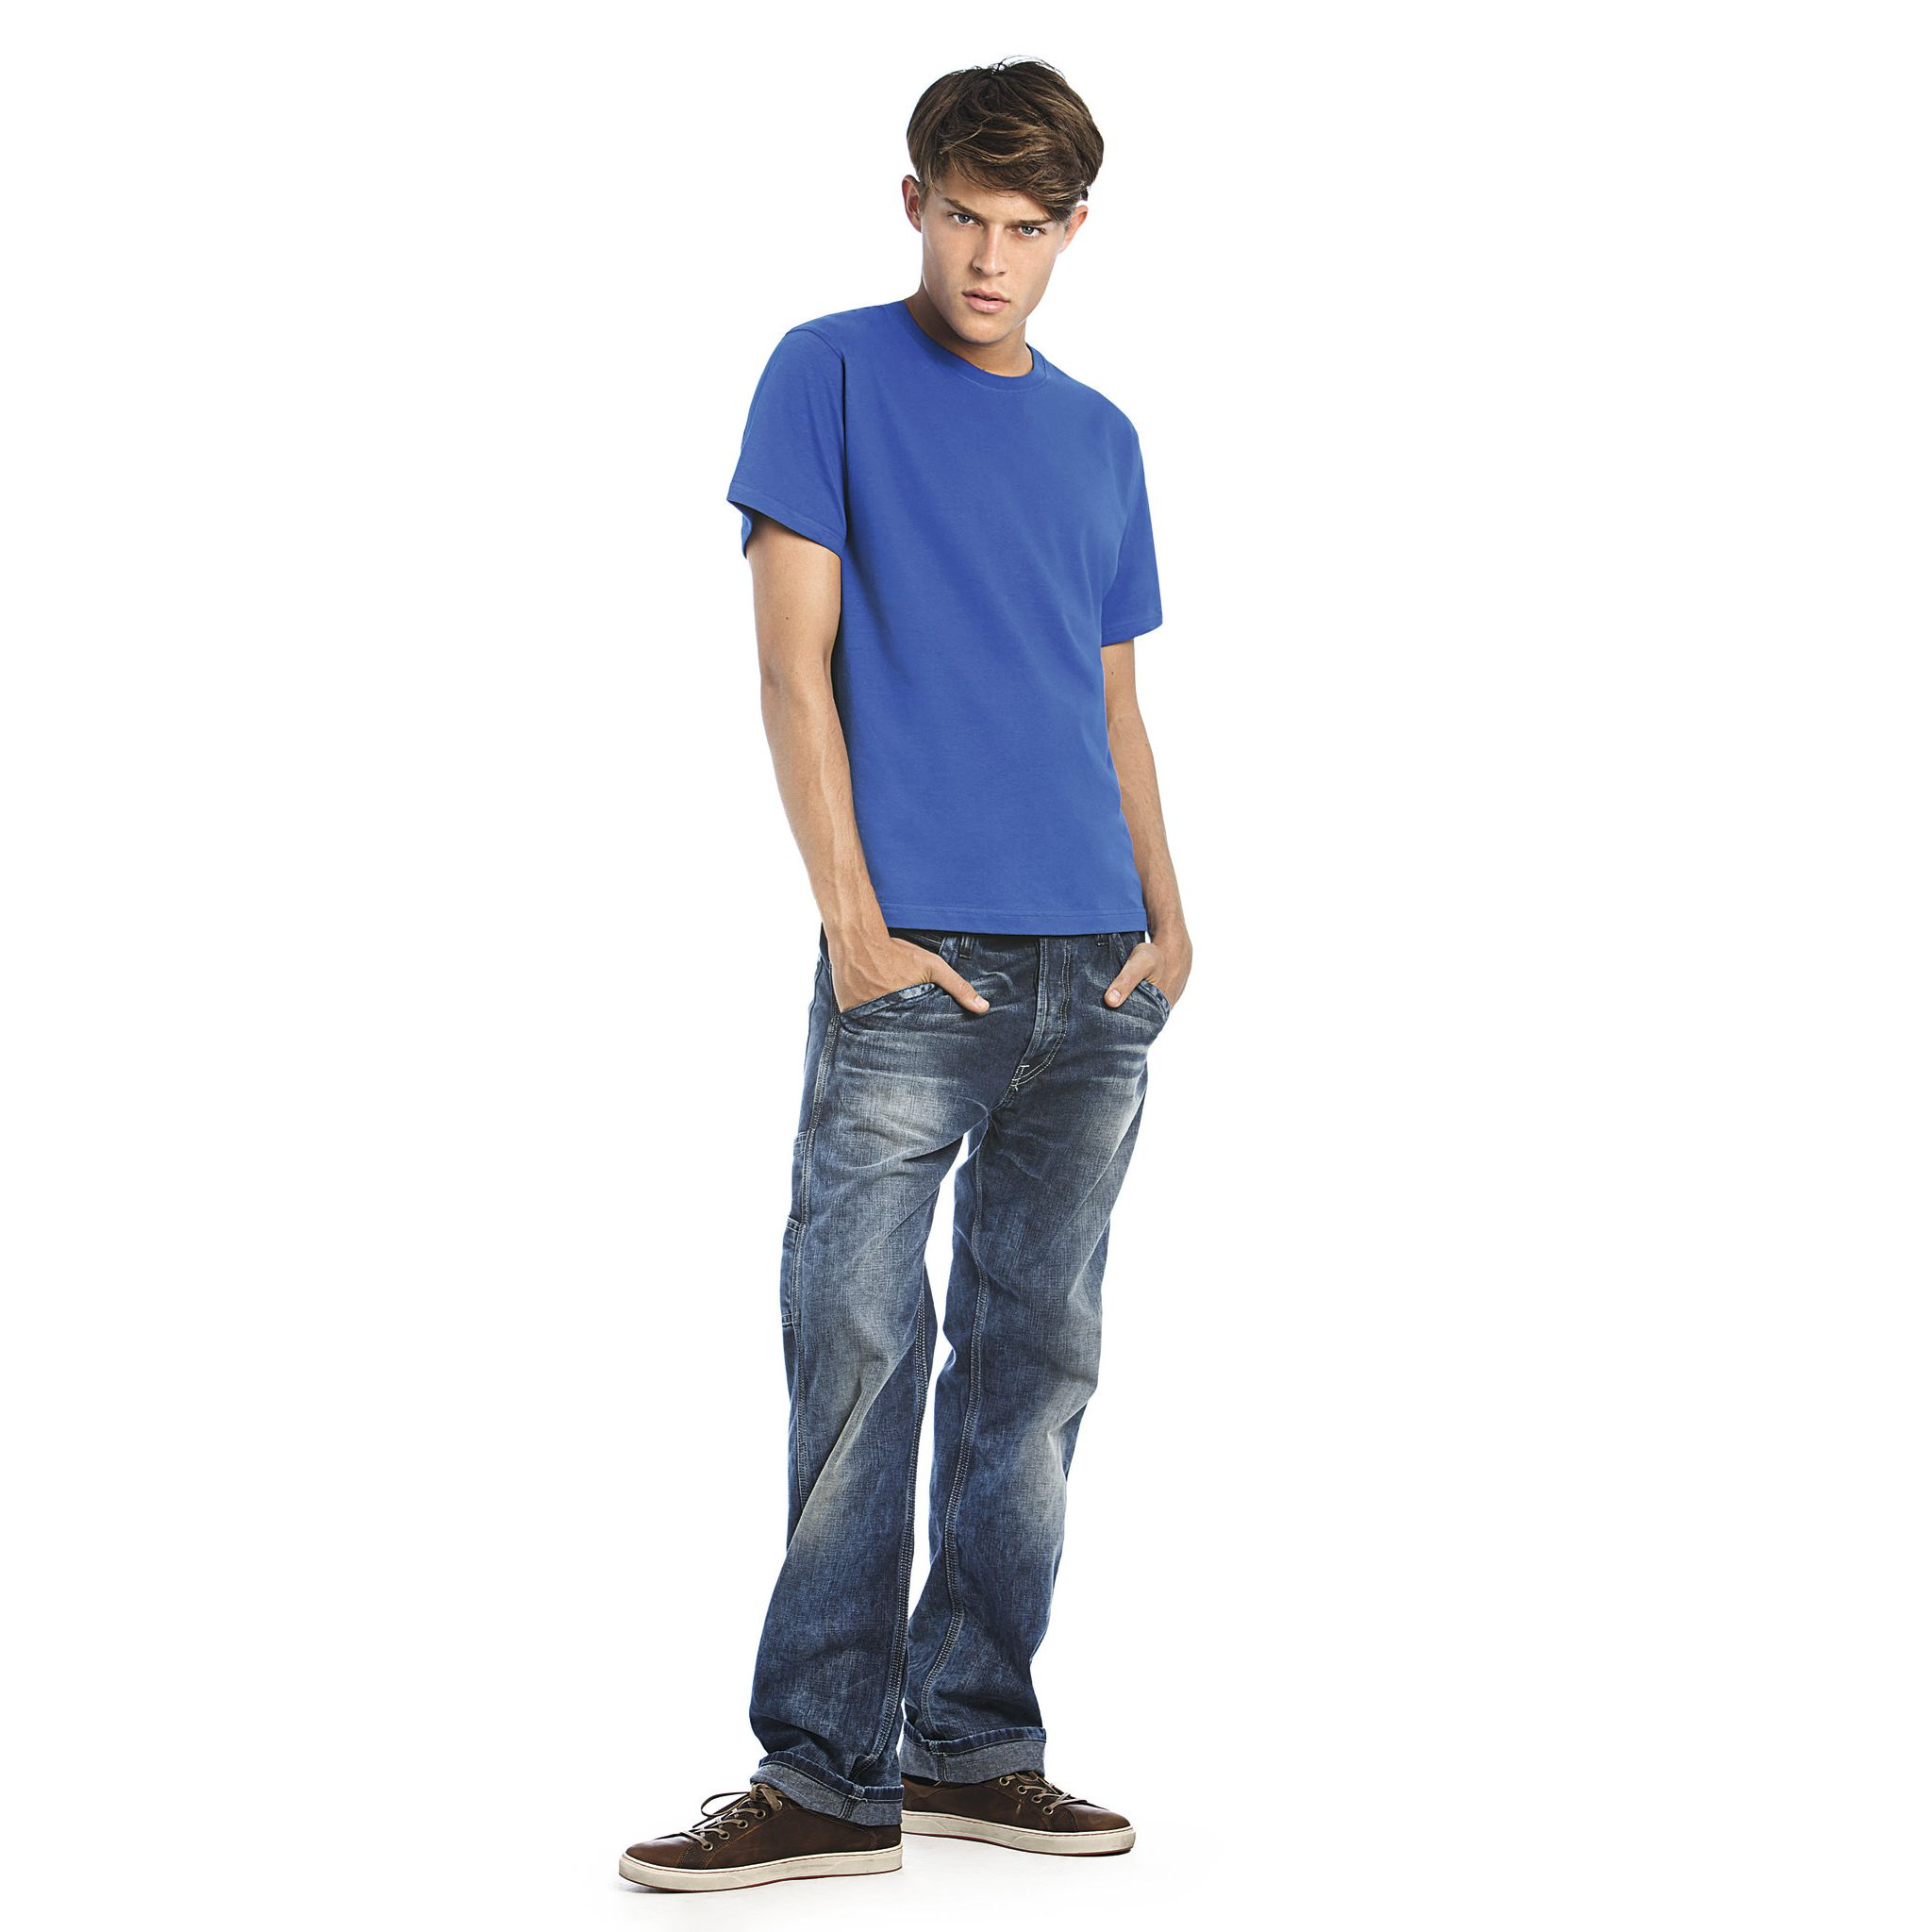 exact-190-top-men-tee-shirt-homme-coupe-cintree-190